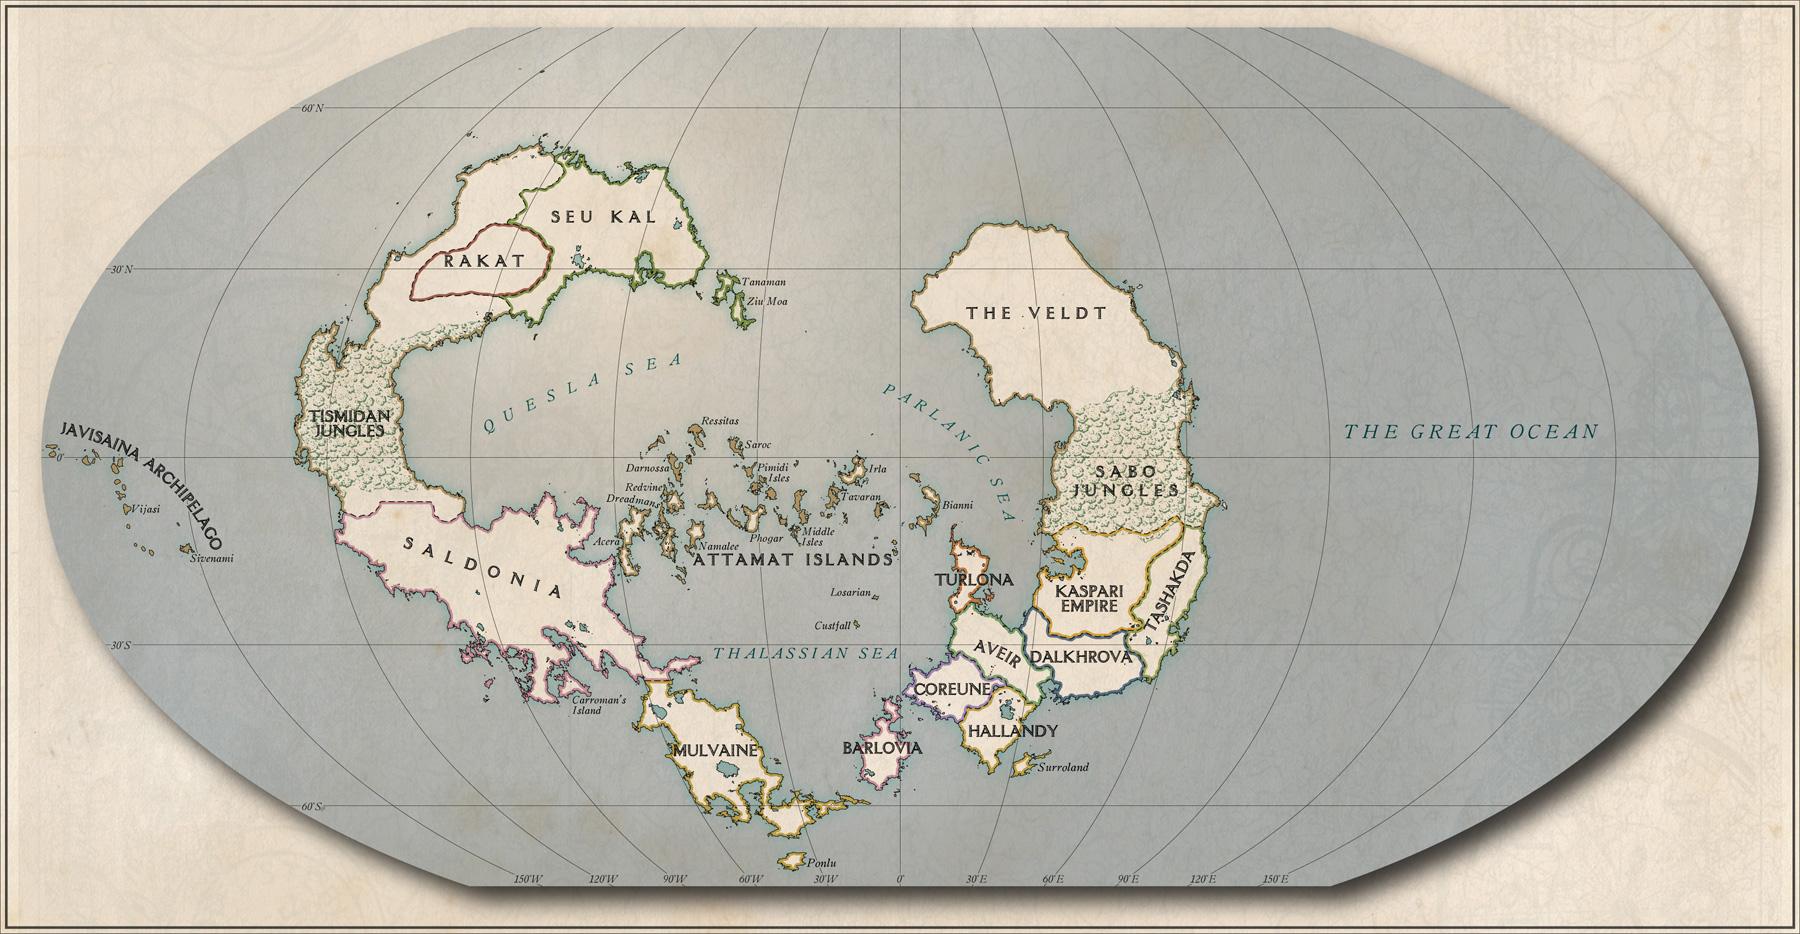 The World of Jikosa | Jikosa Wiki | FANDOM powered by Wikia